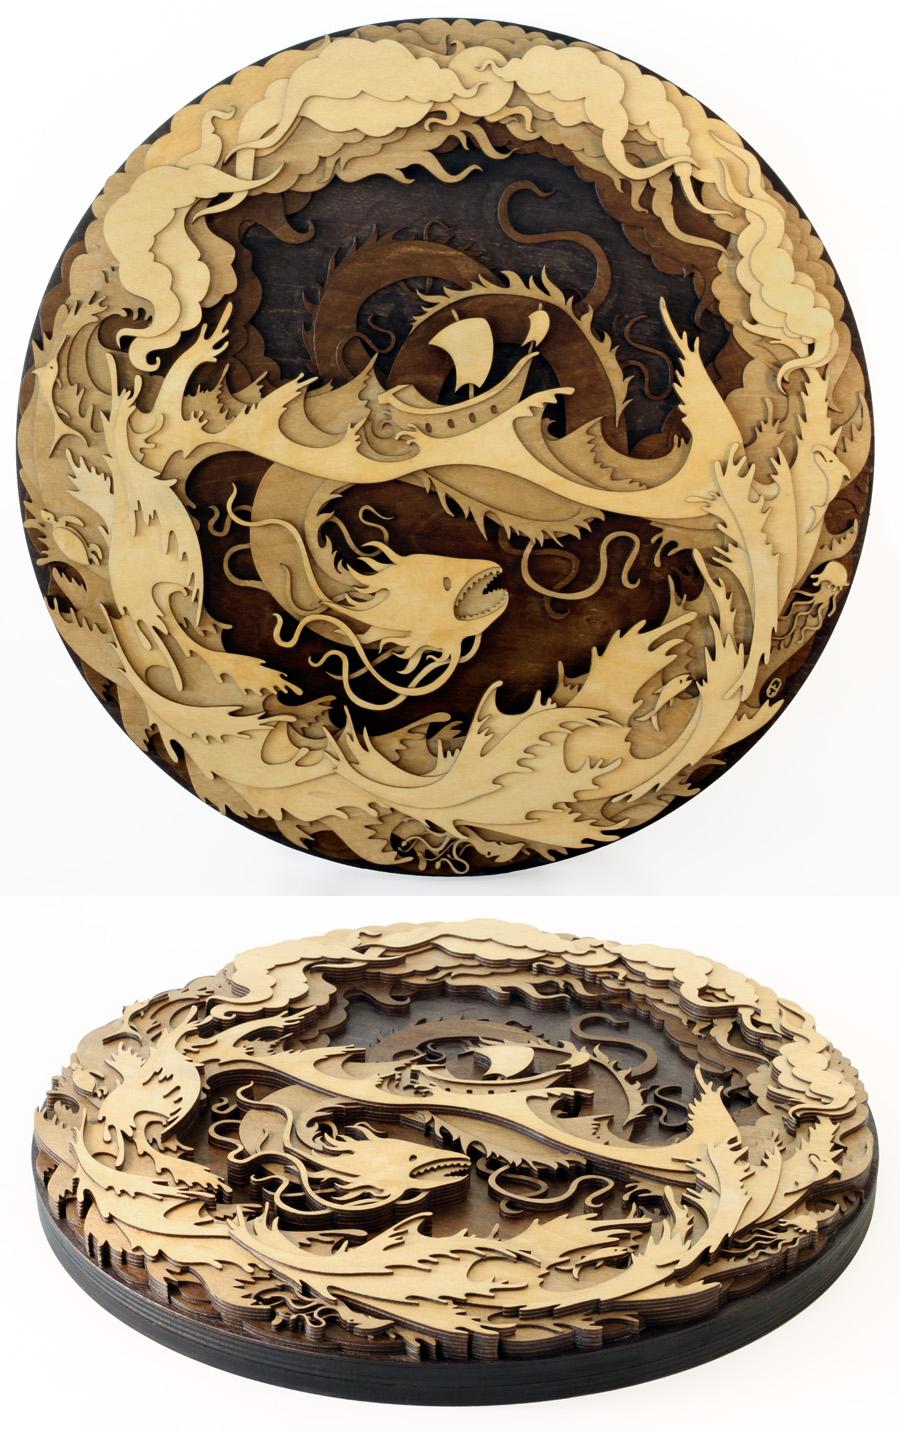 Sea Serpent by mtomsky